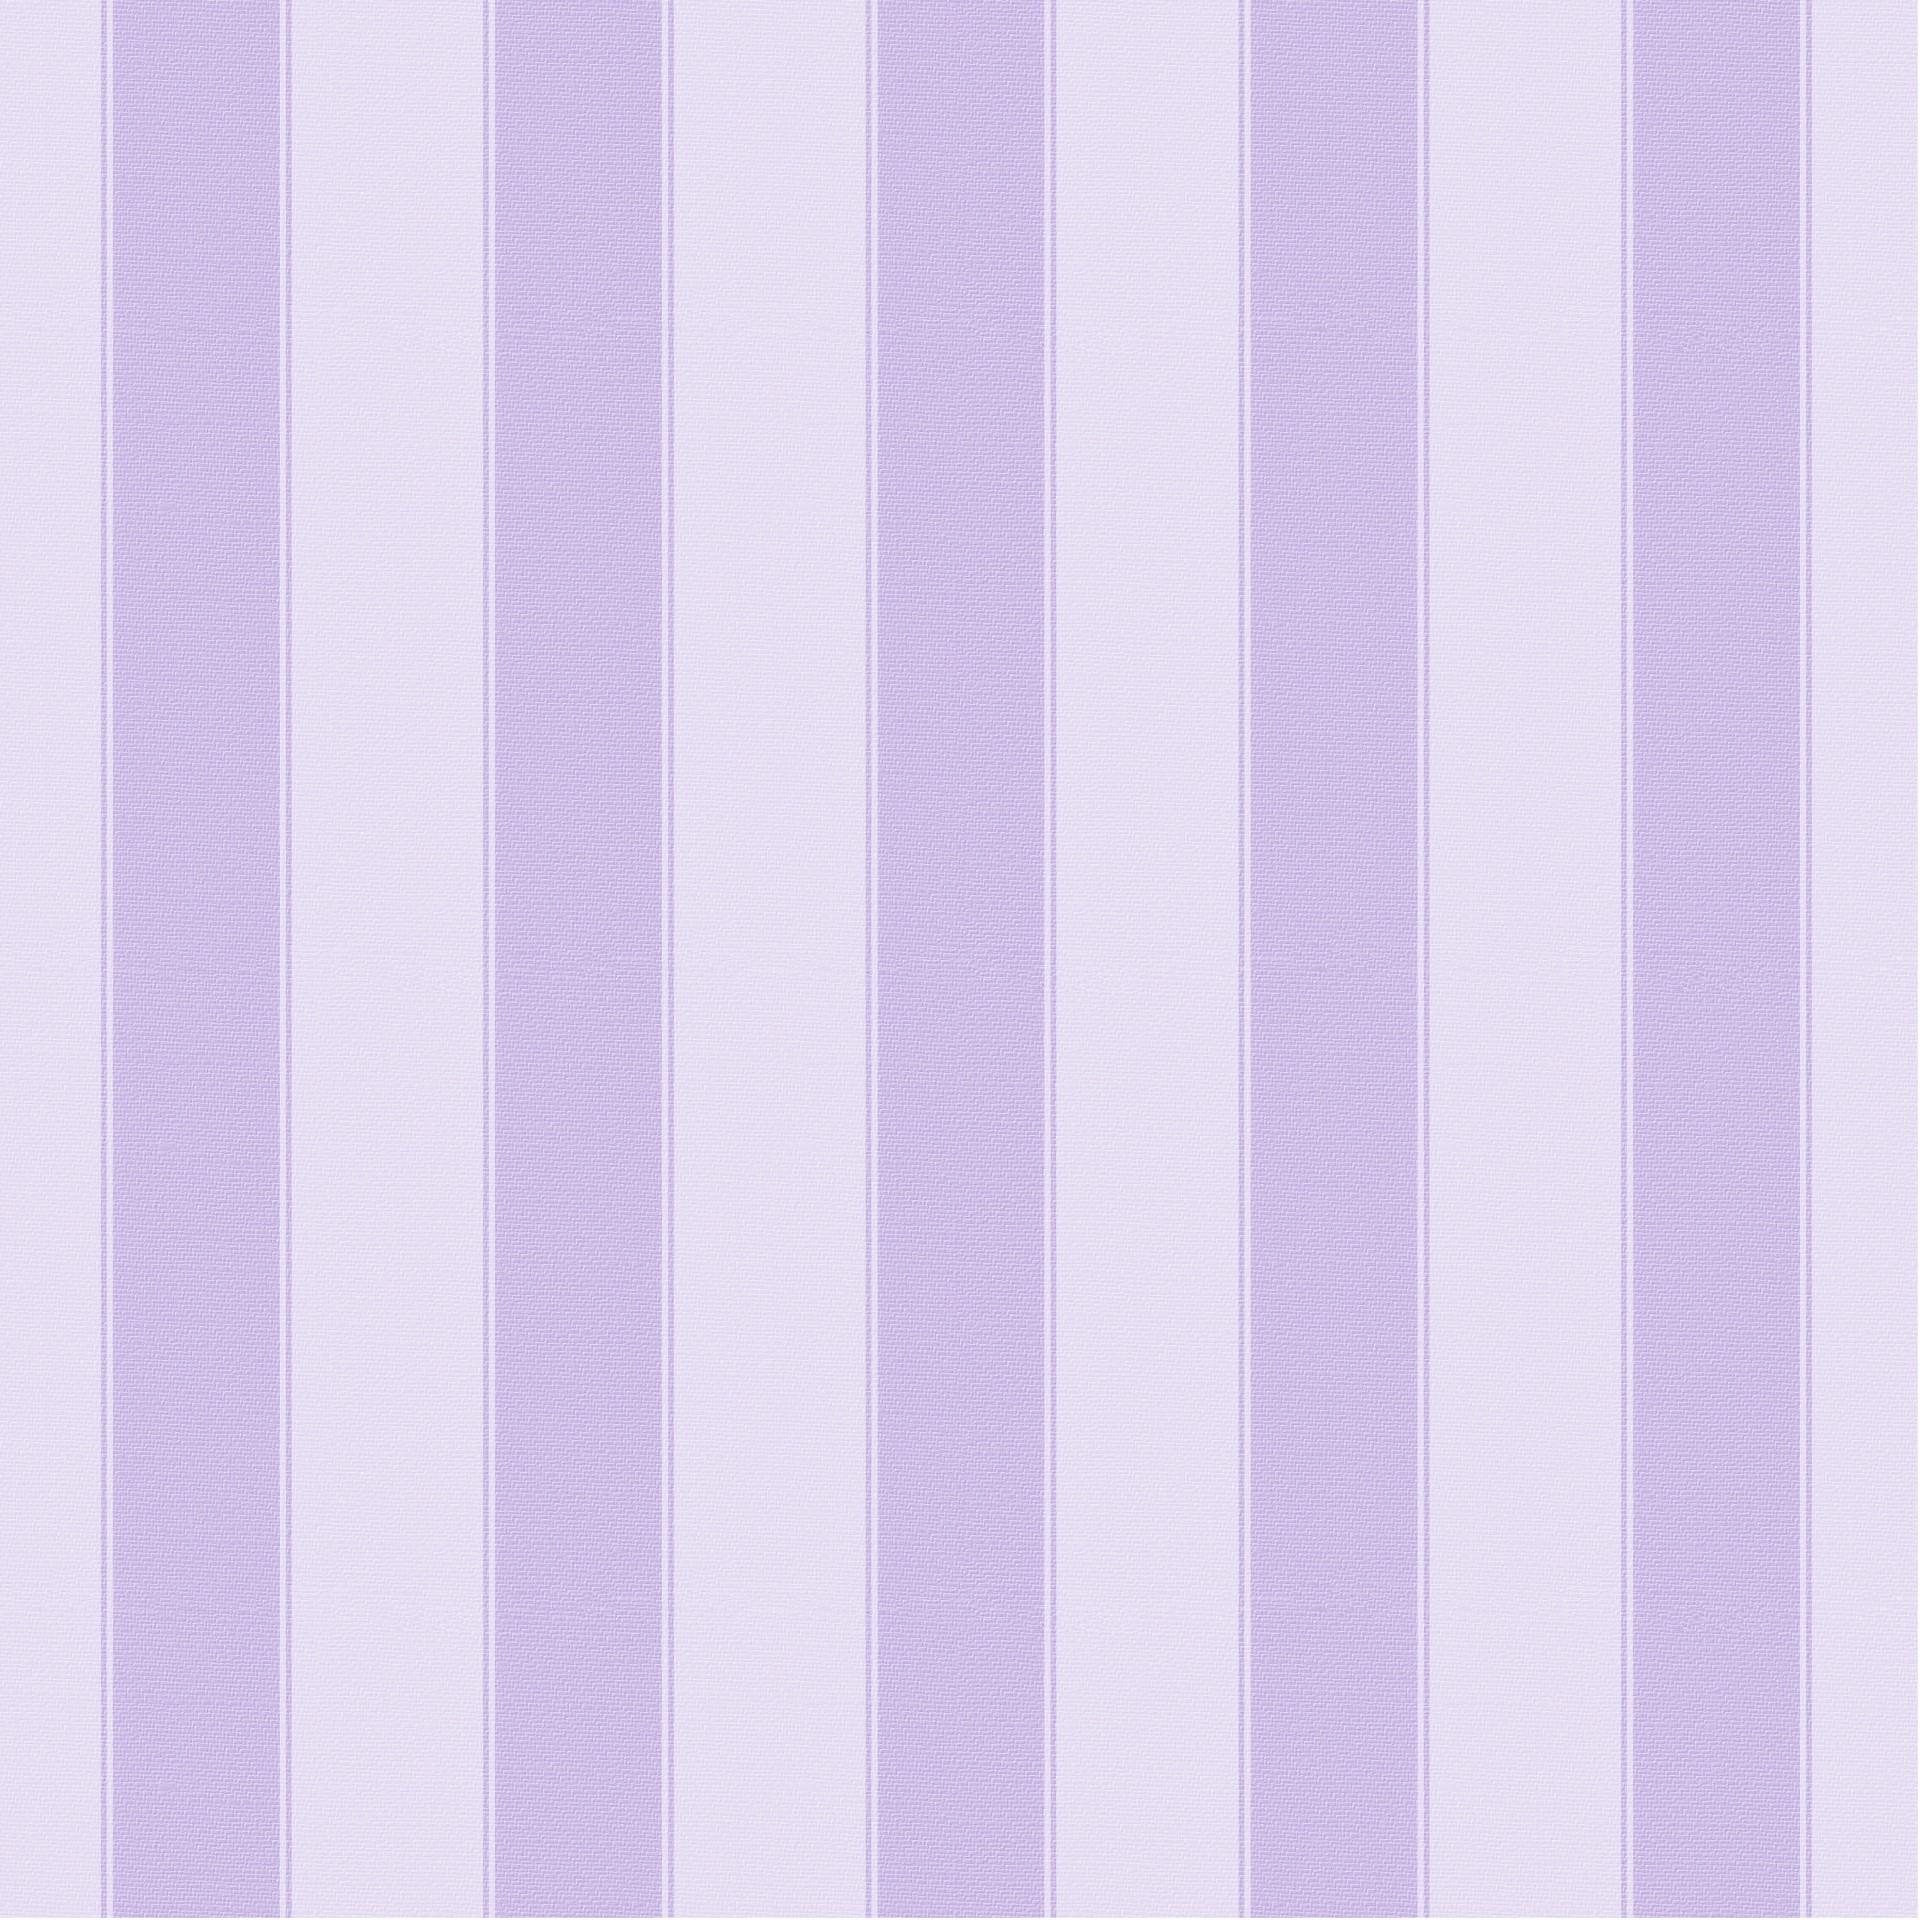 Stripes Background Purple Lavender